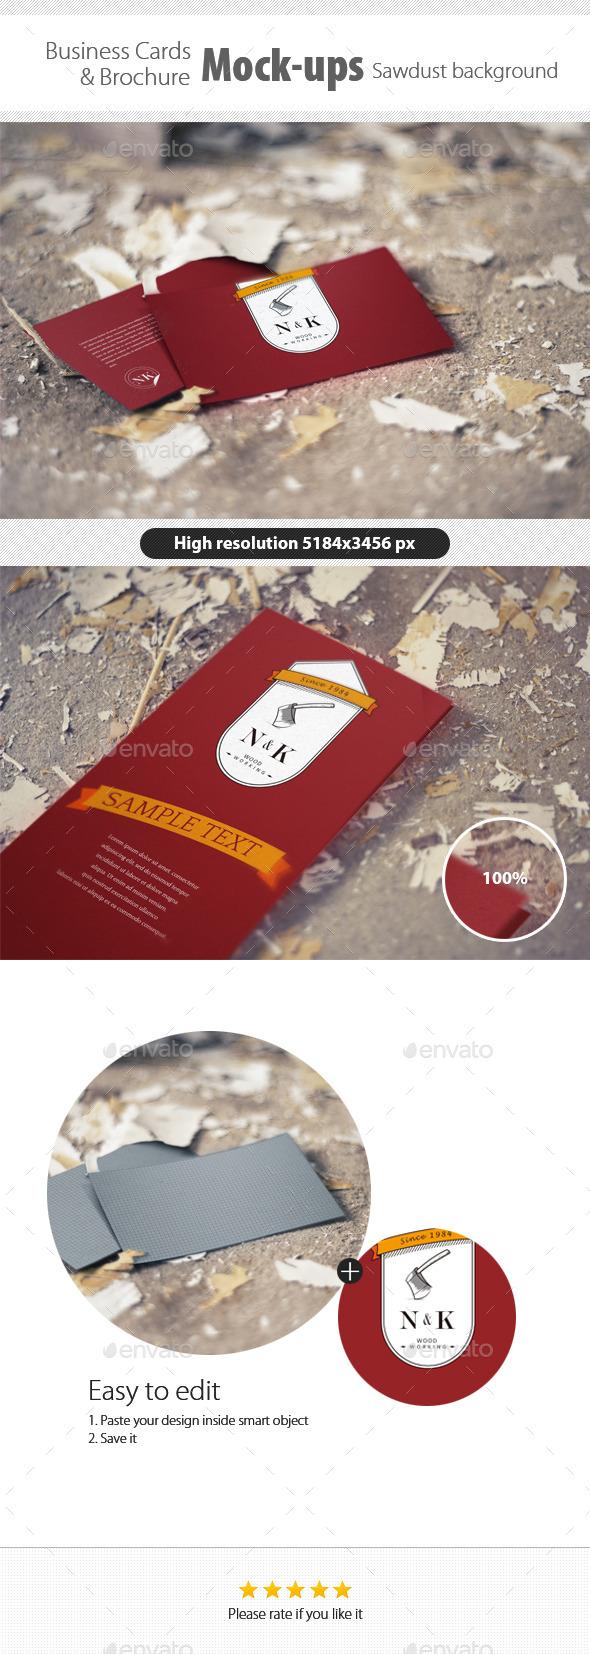 Business Card/Brochure Mock-Ups Sawdust Background - Business Cards Print